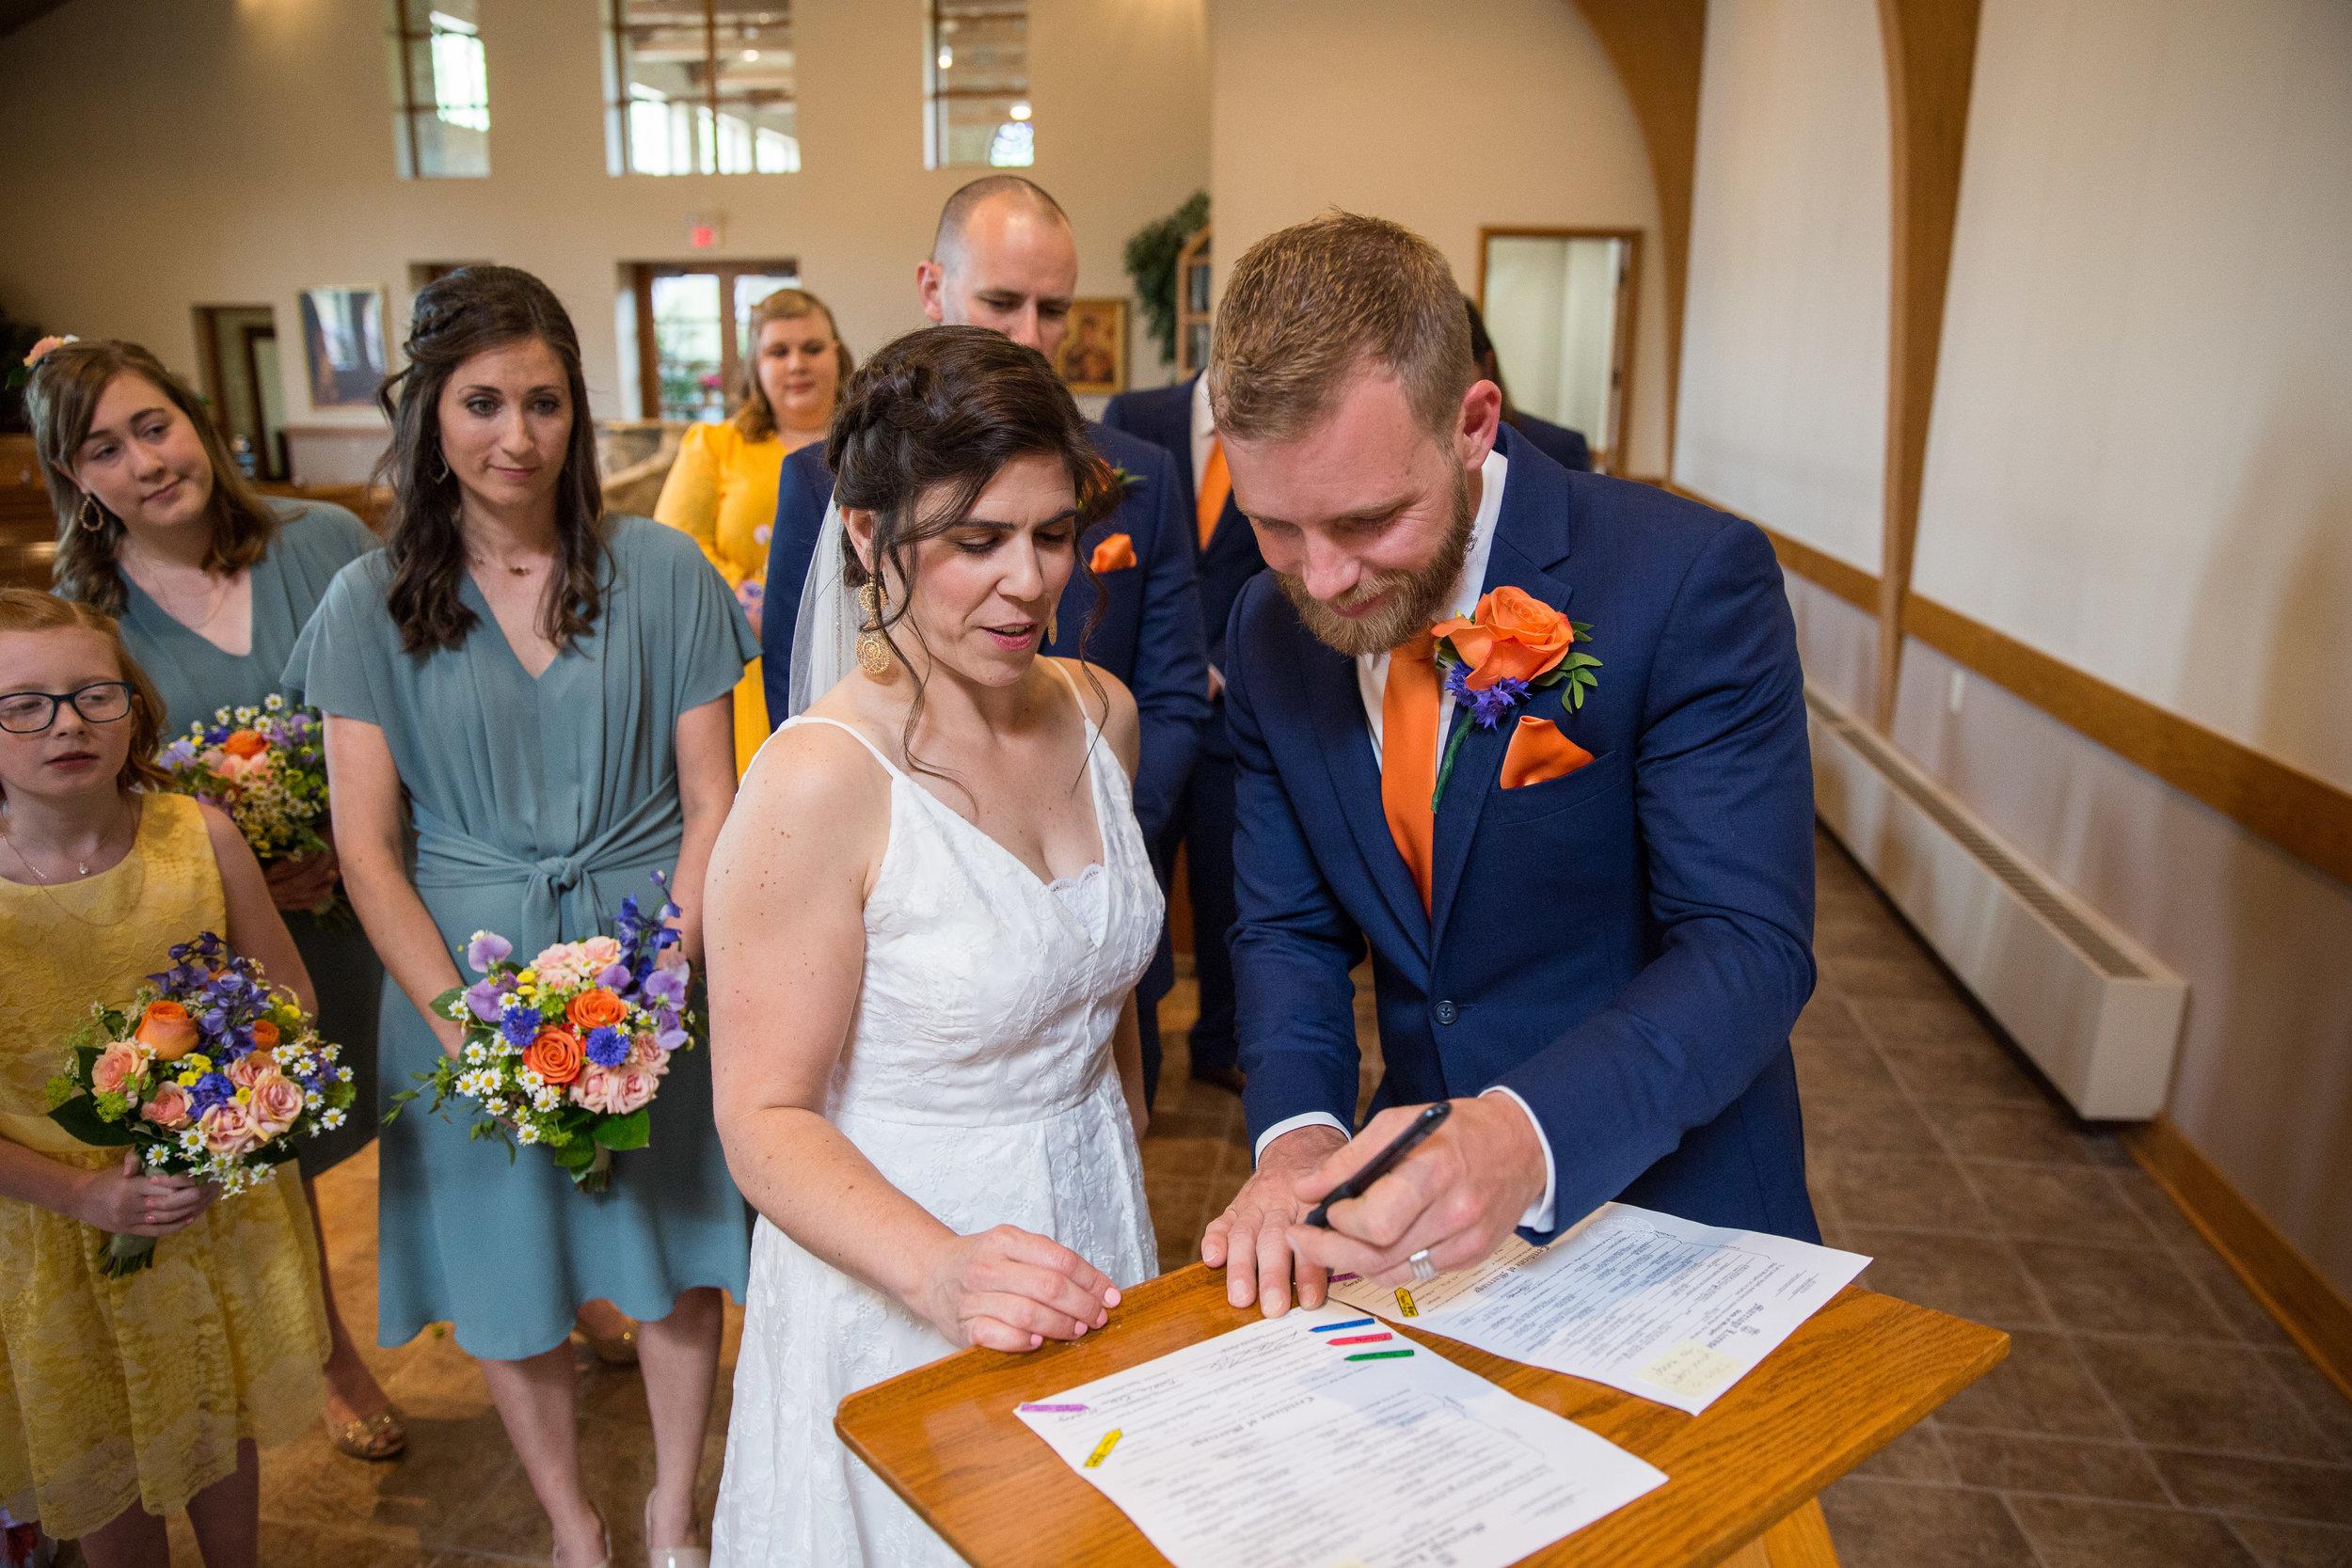 Natalie and Dallas Mooney Wedding 6-8-19_Tania Watt Photography-160.jpg